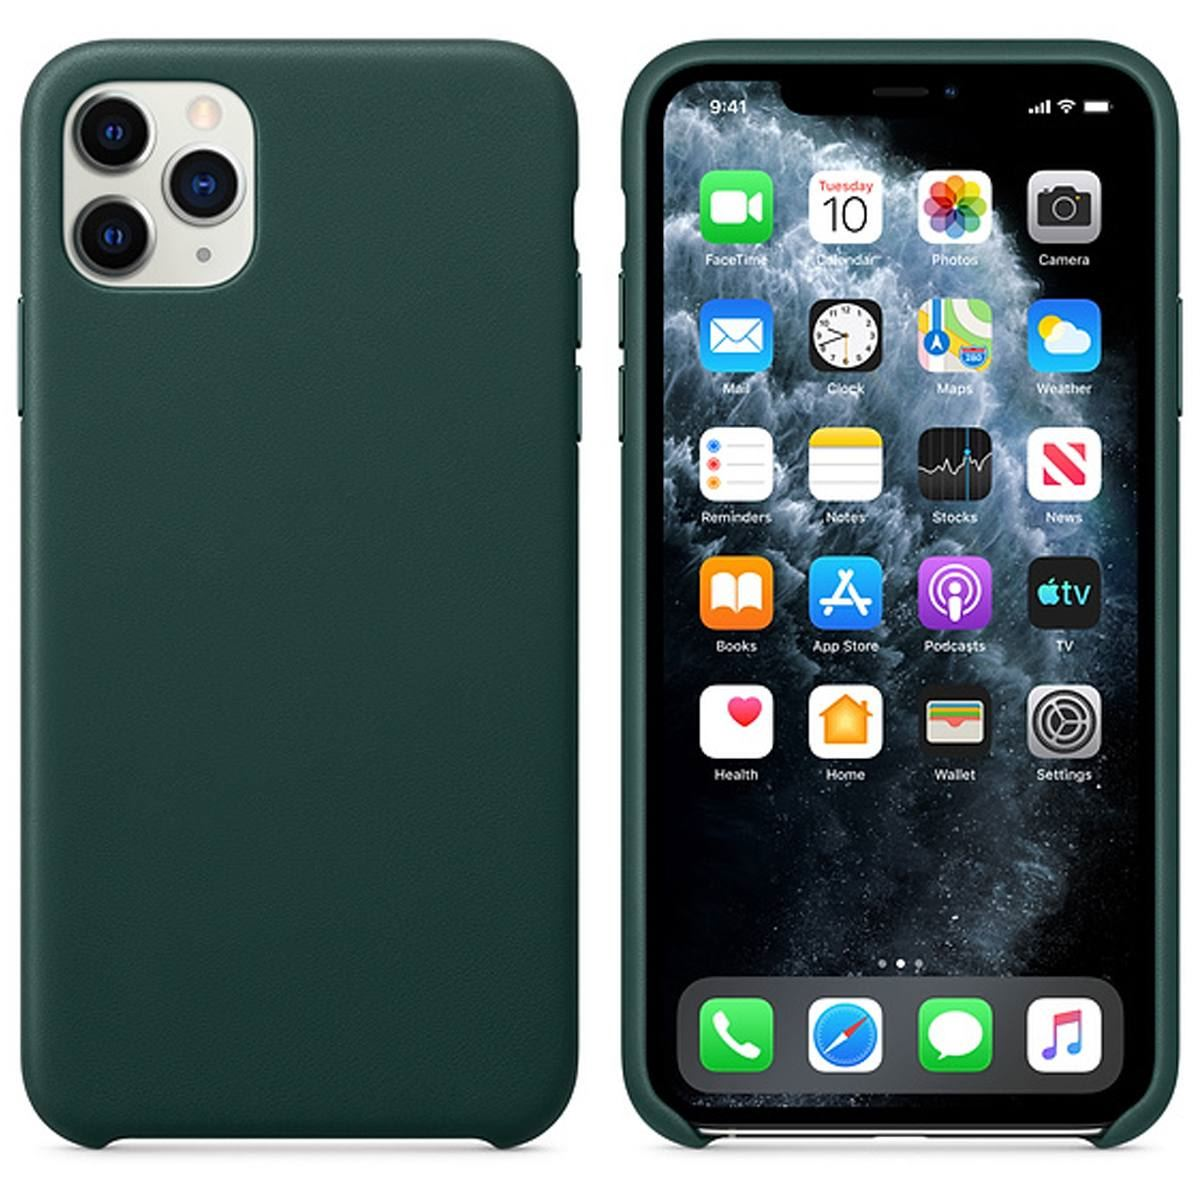 Leather-Slim-Case-Apple-iPhone-10-8-7-Plus-6s-5-Original-PU-Soft-Silicone-Cover thumbnail 17